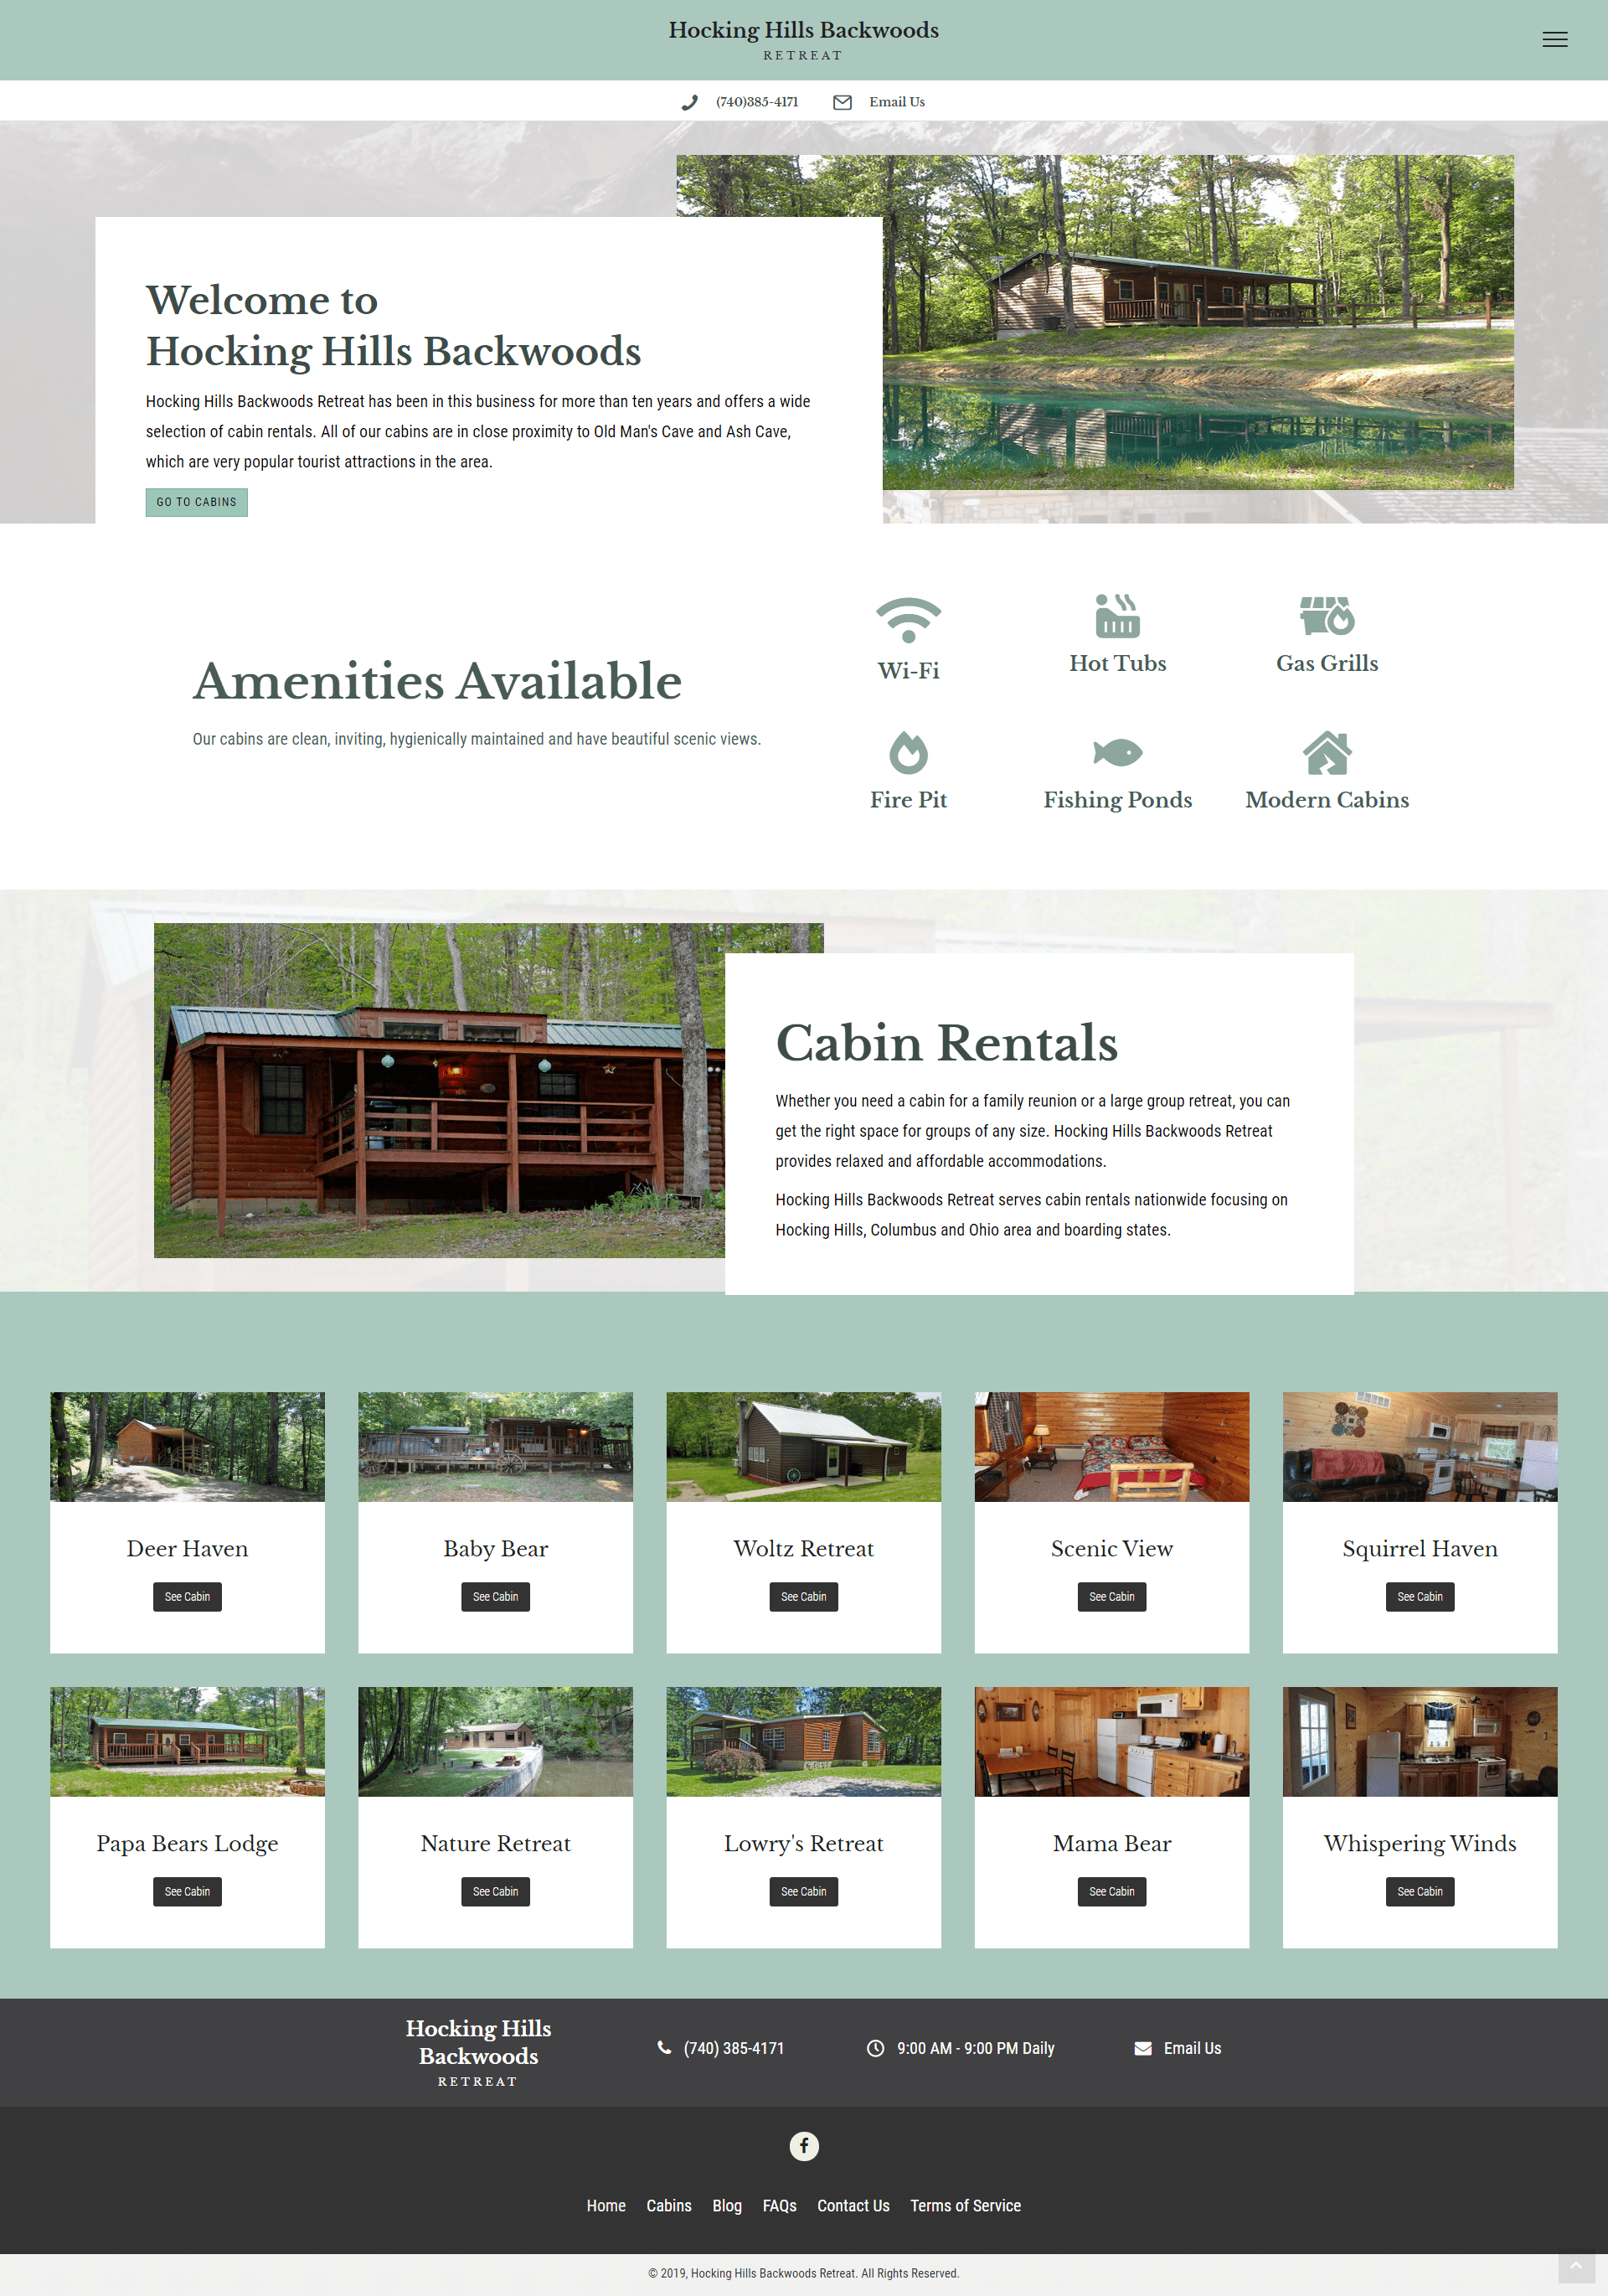 screencapture-Hocking Hills Backwoods Retreat-desktop